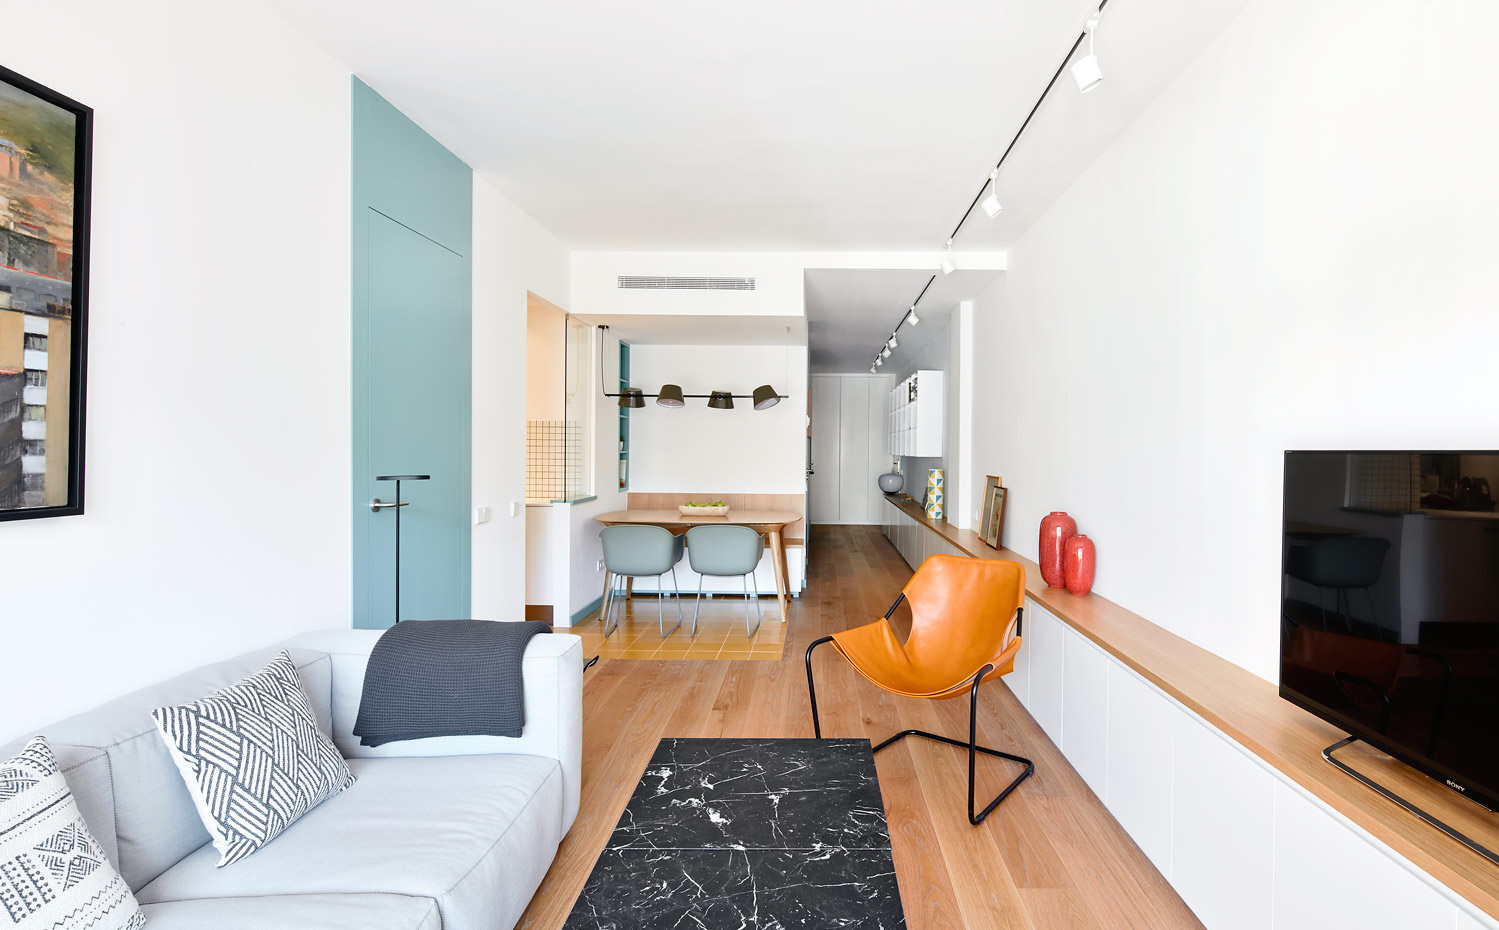 Reforma del piso 2DM en Barcelona por Bonba Studio